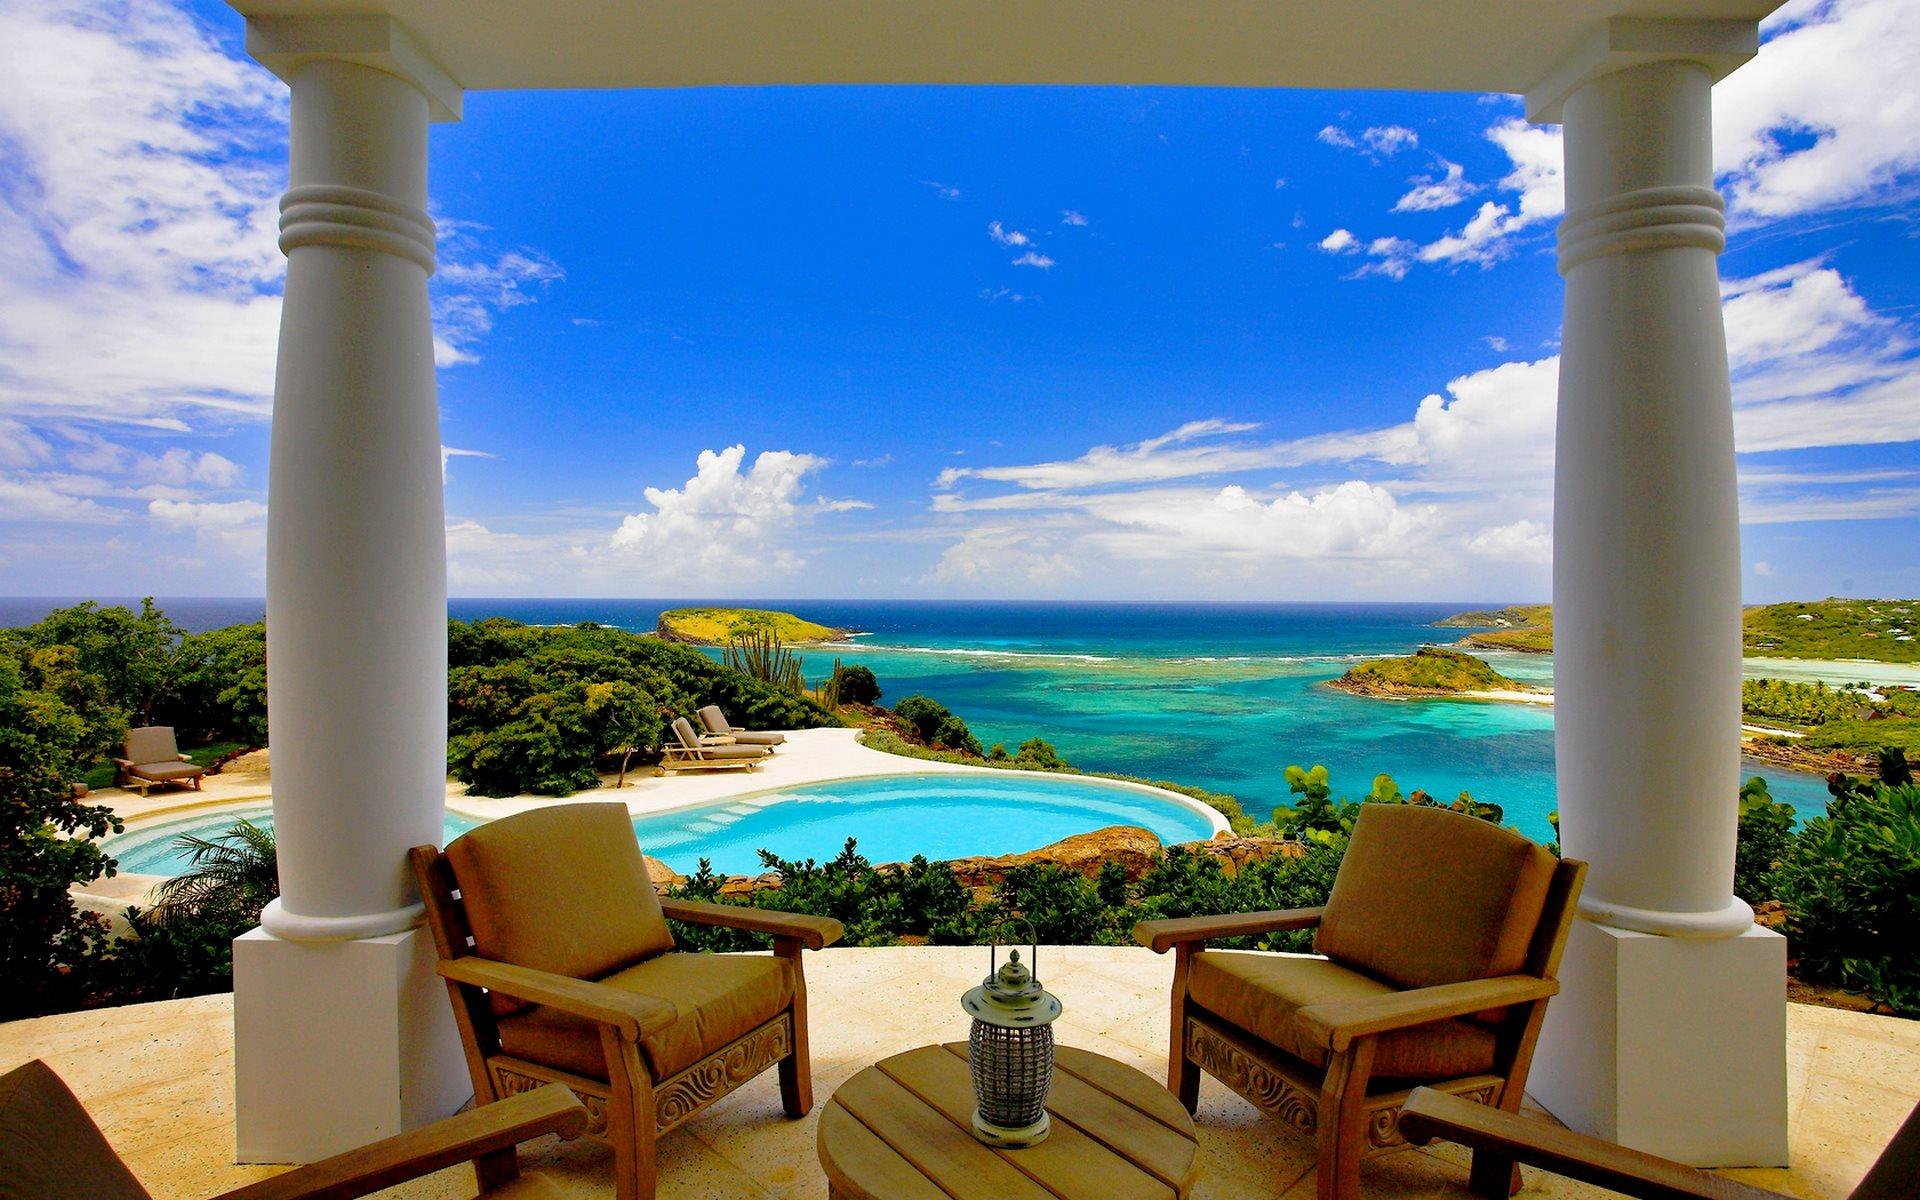 Summer Vacation Dream Wallpaper [1920x1200] 1920x1200